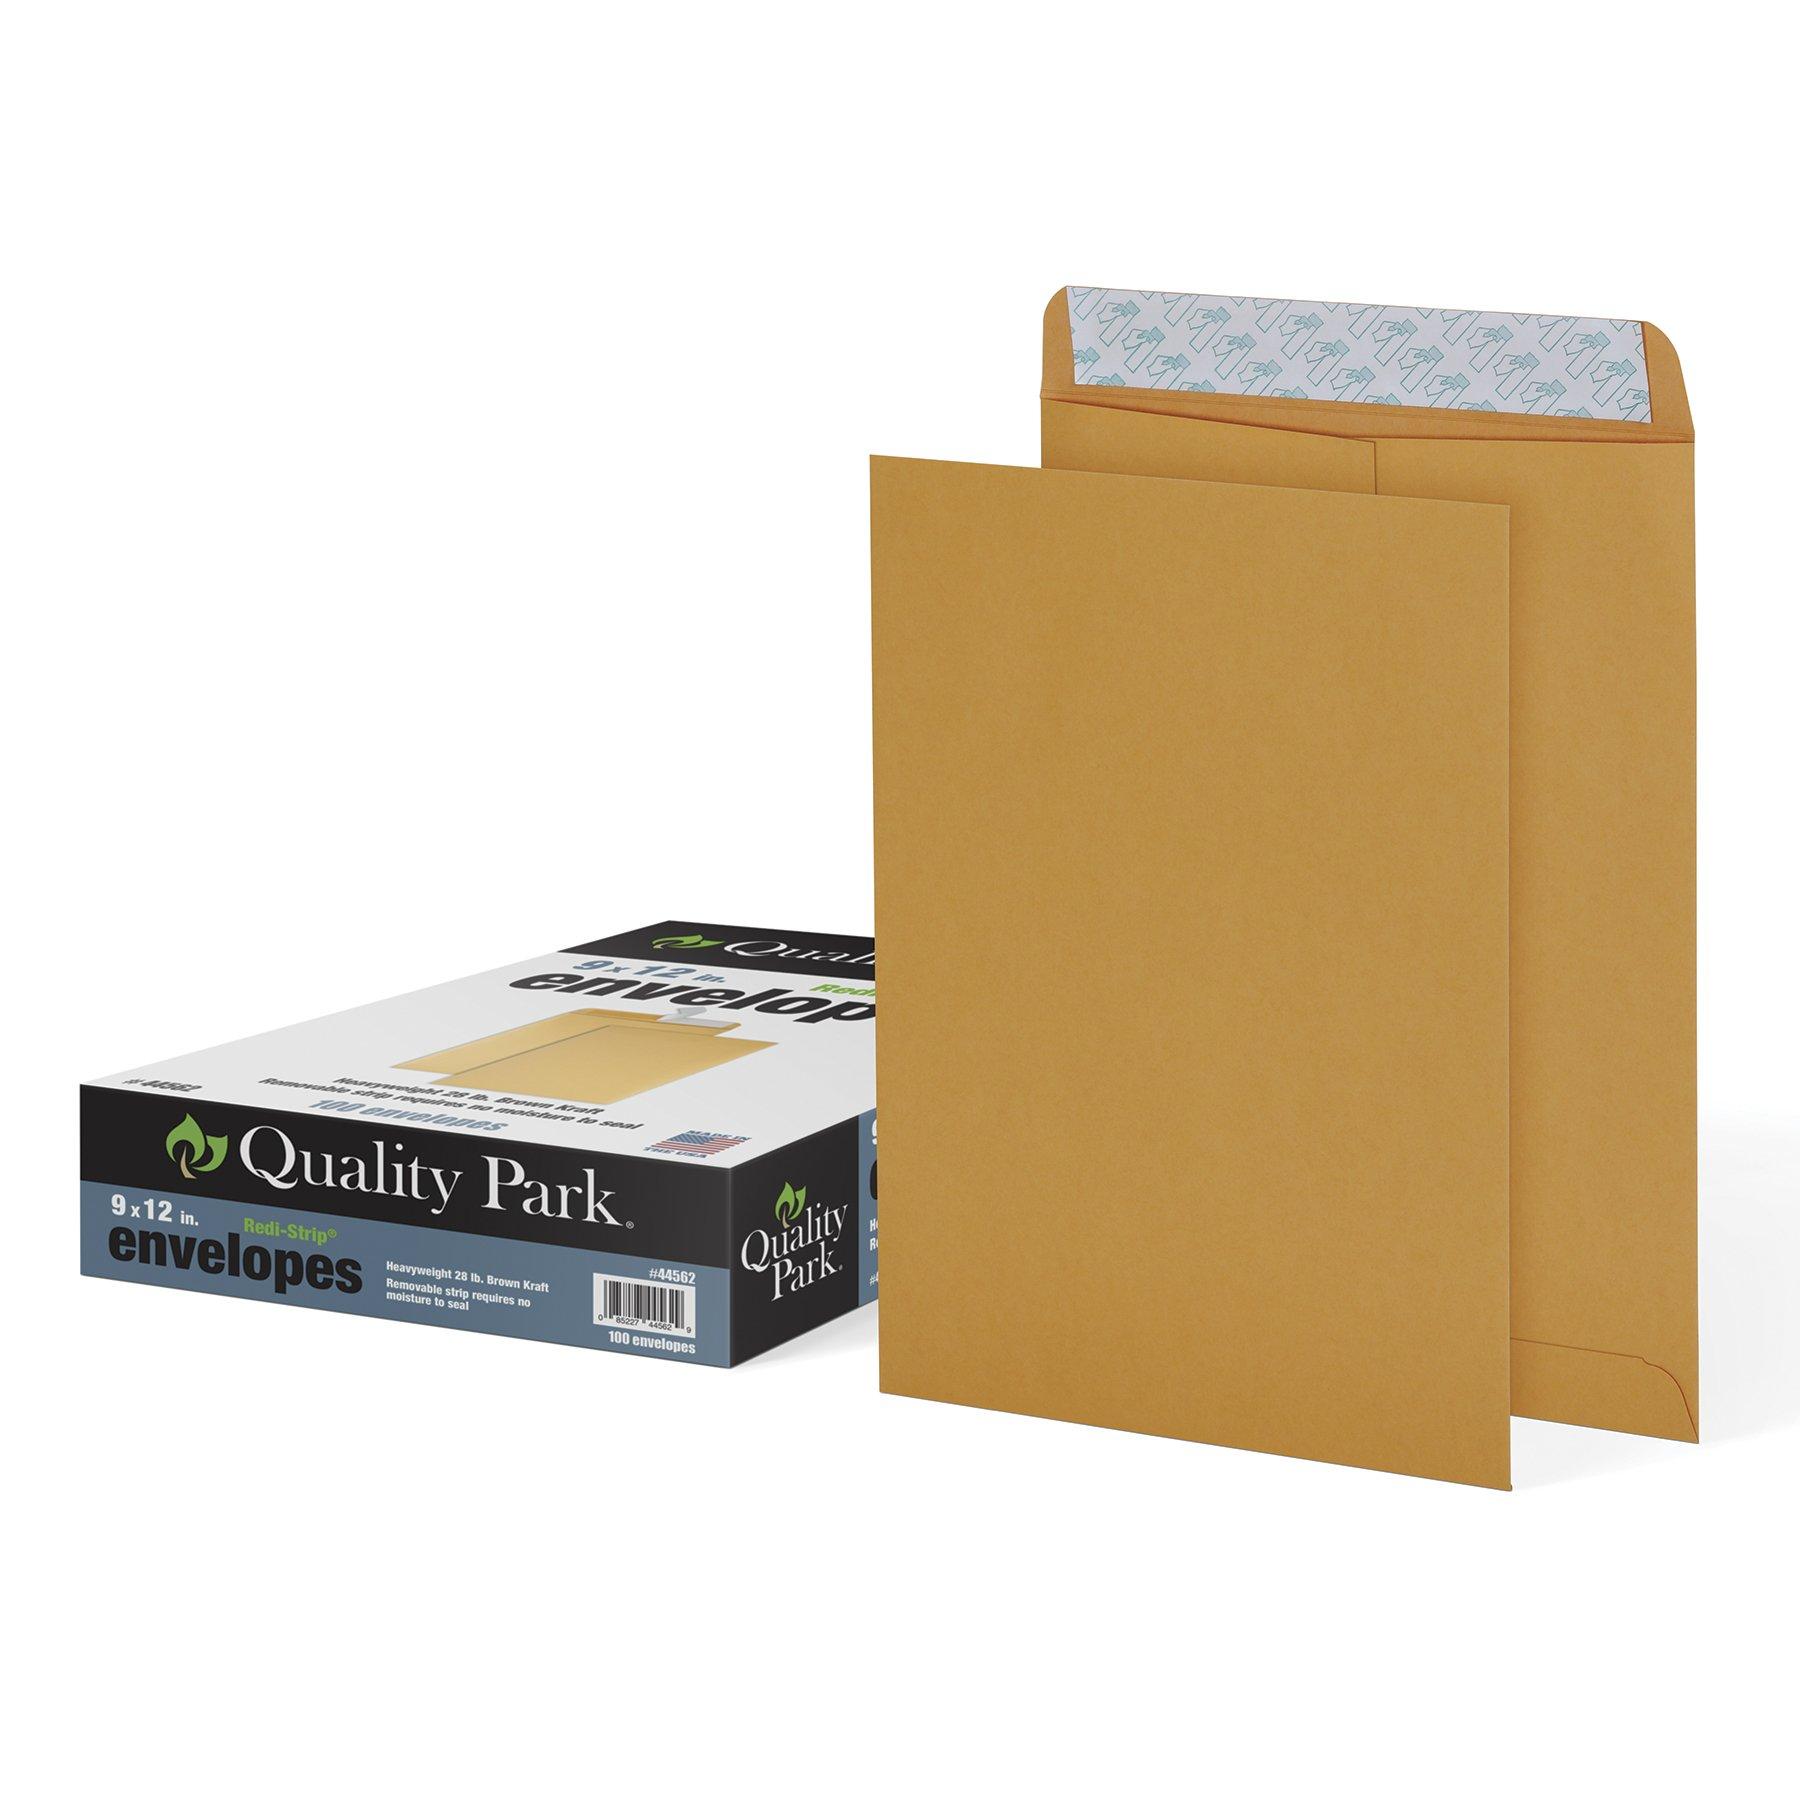 Quality Park 9'' x 12'' Self-Seal Catalog Envelopes, For Mailing, Organizing and Storage, Brown Kraft, Heavy 28-lb Paper, 100 Per Box (QUA44562)